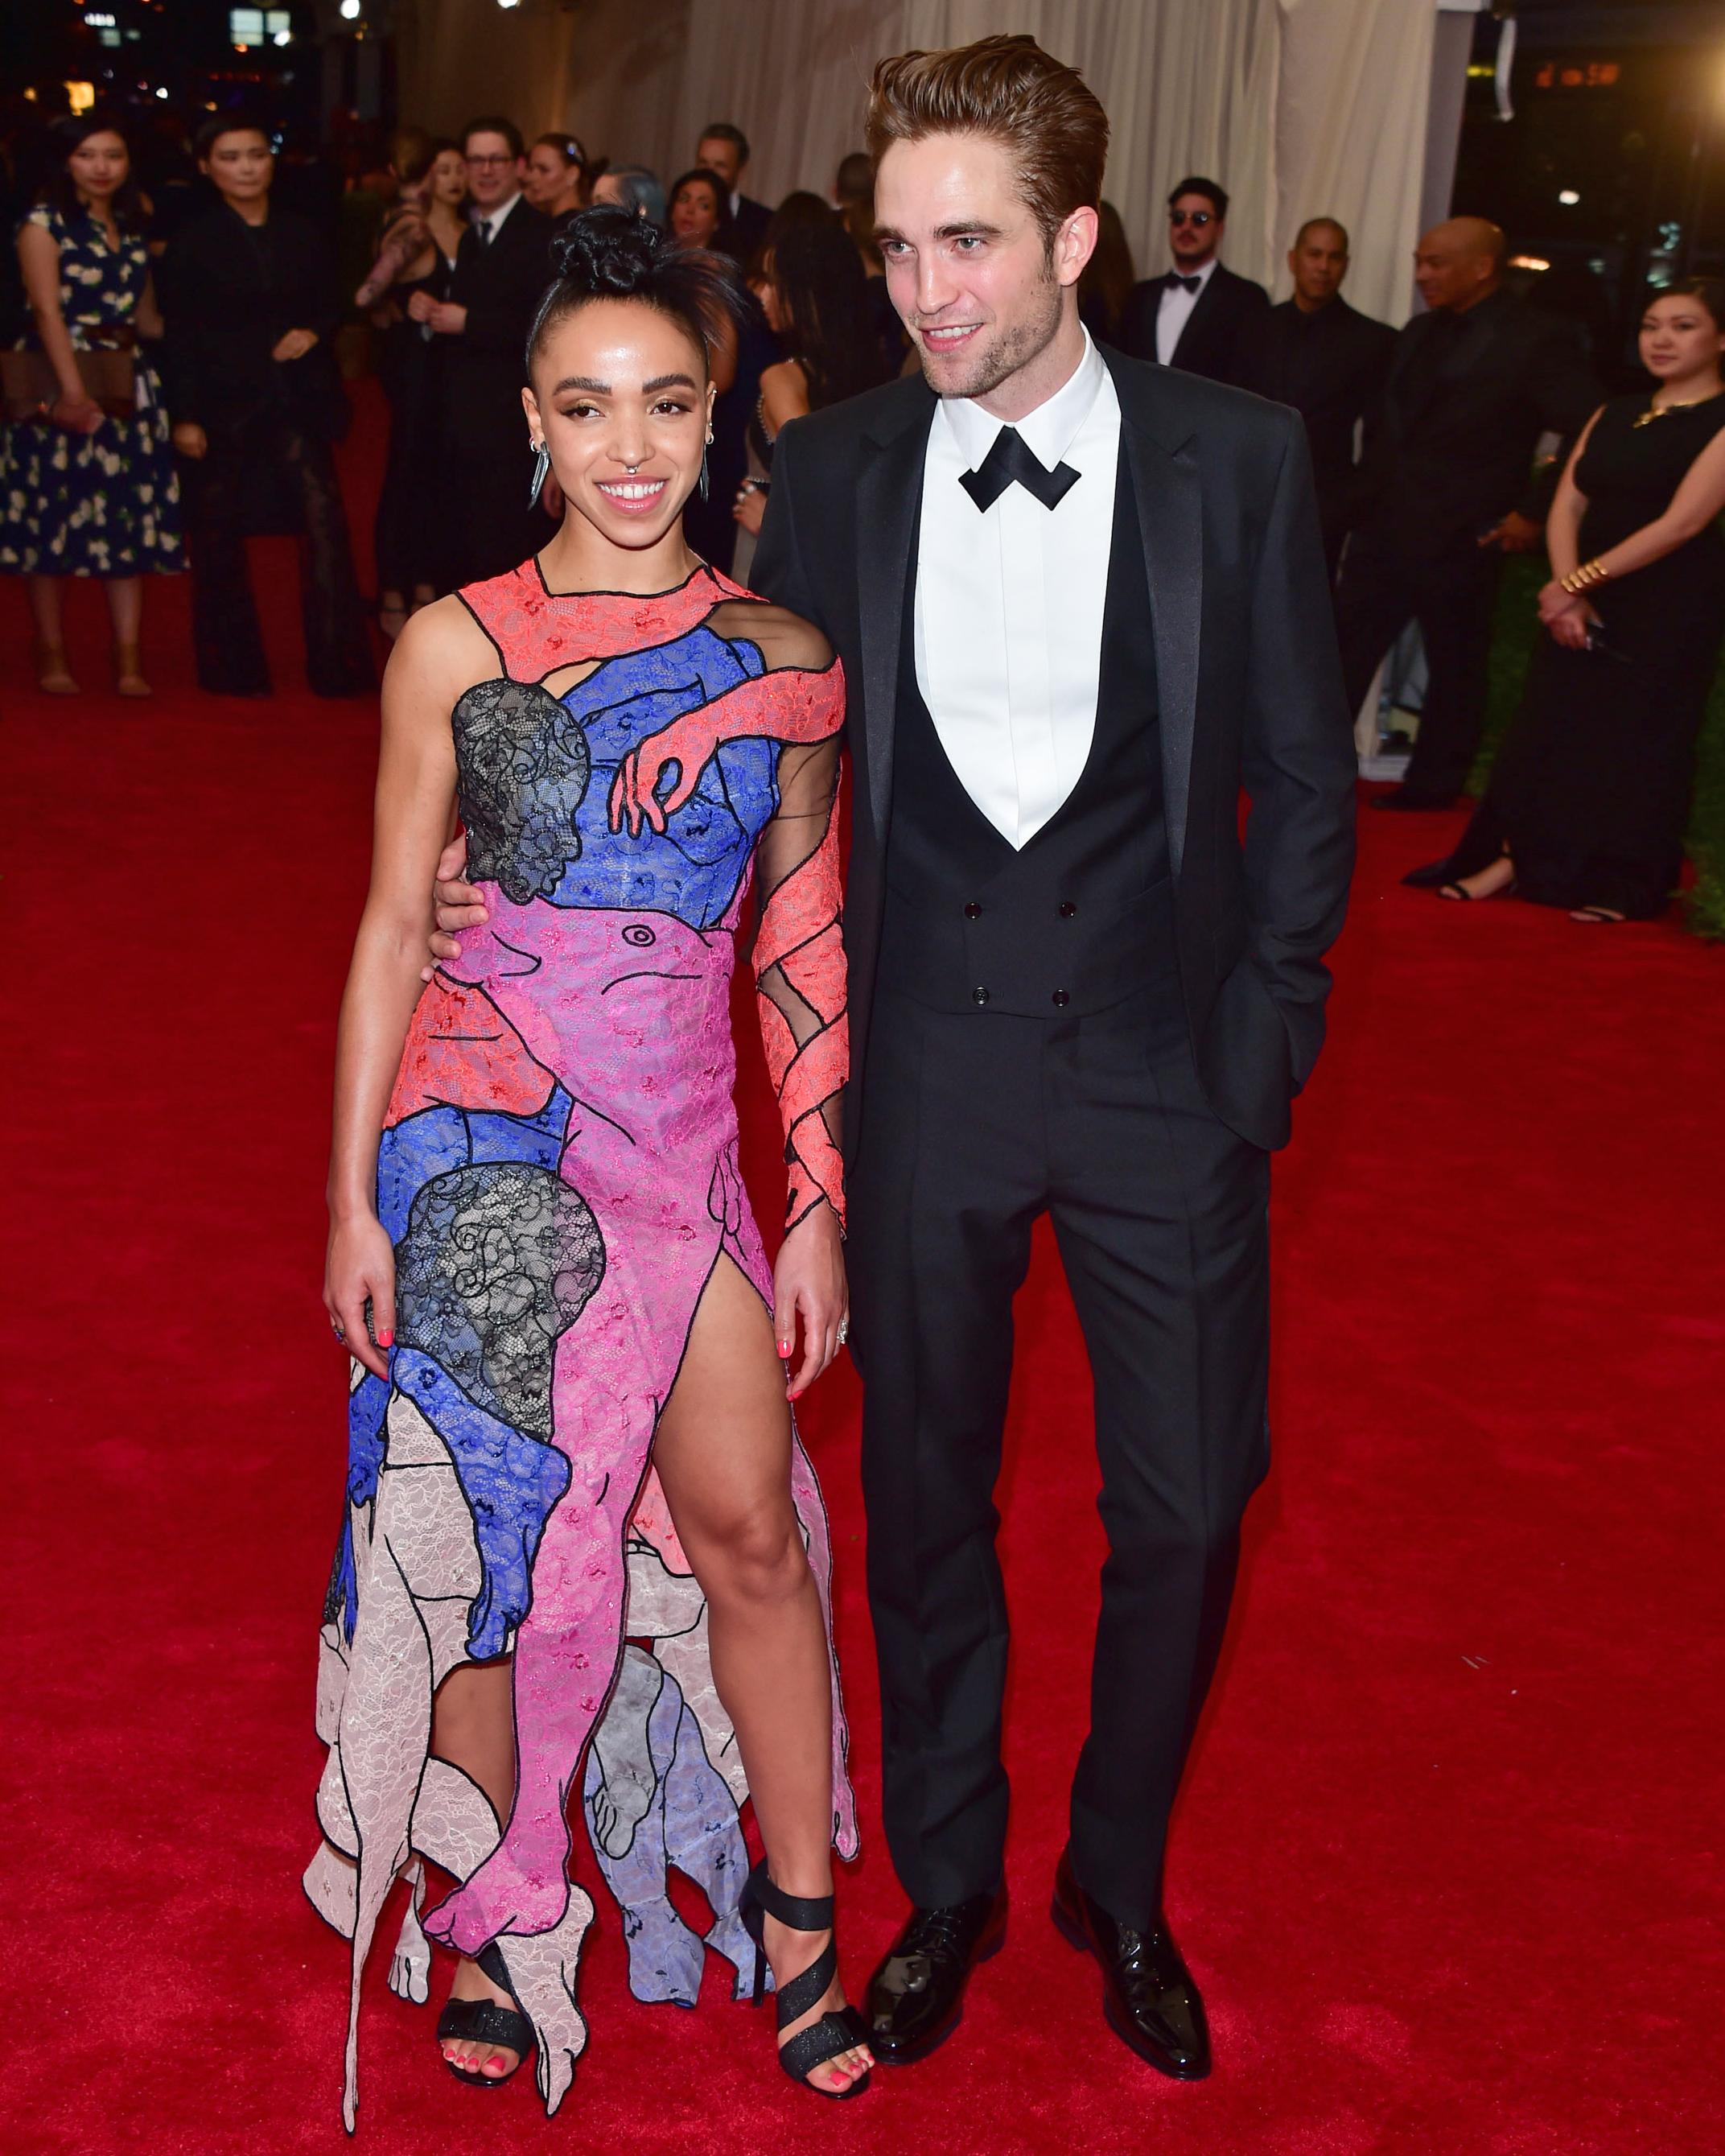 robert-pattinson-fka-twigs-marry-me-martha-together-red-carpet-0515.jpg